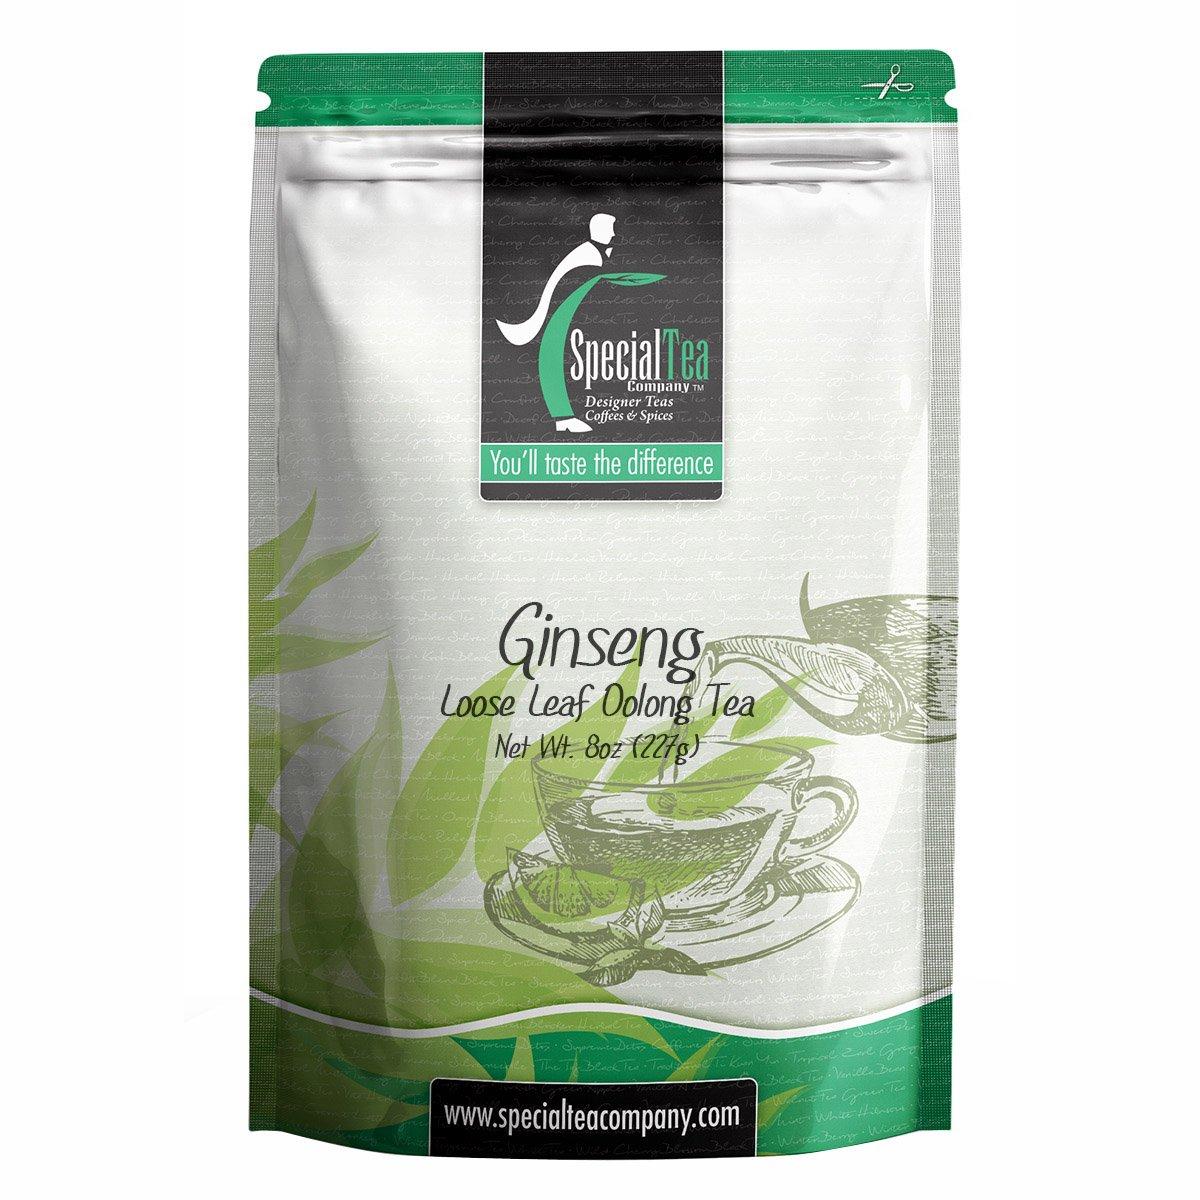 Special Tea Loose Leaf Tea, Ginseng Oolong, 8 Ounce